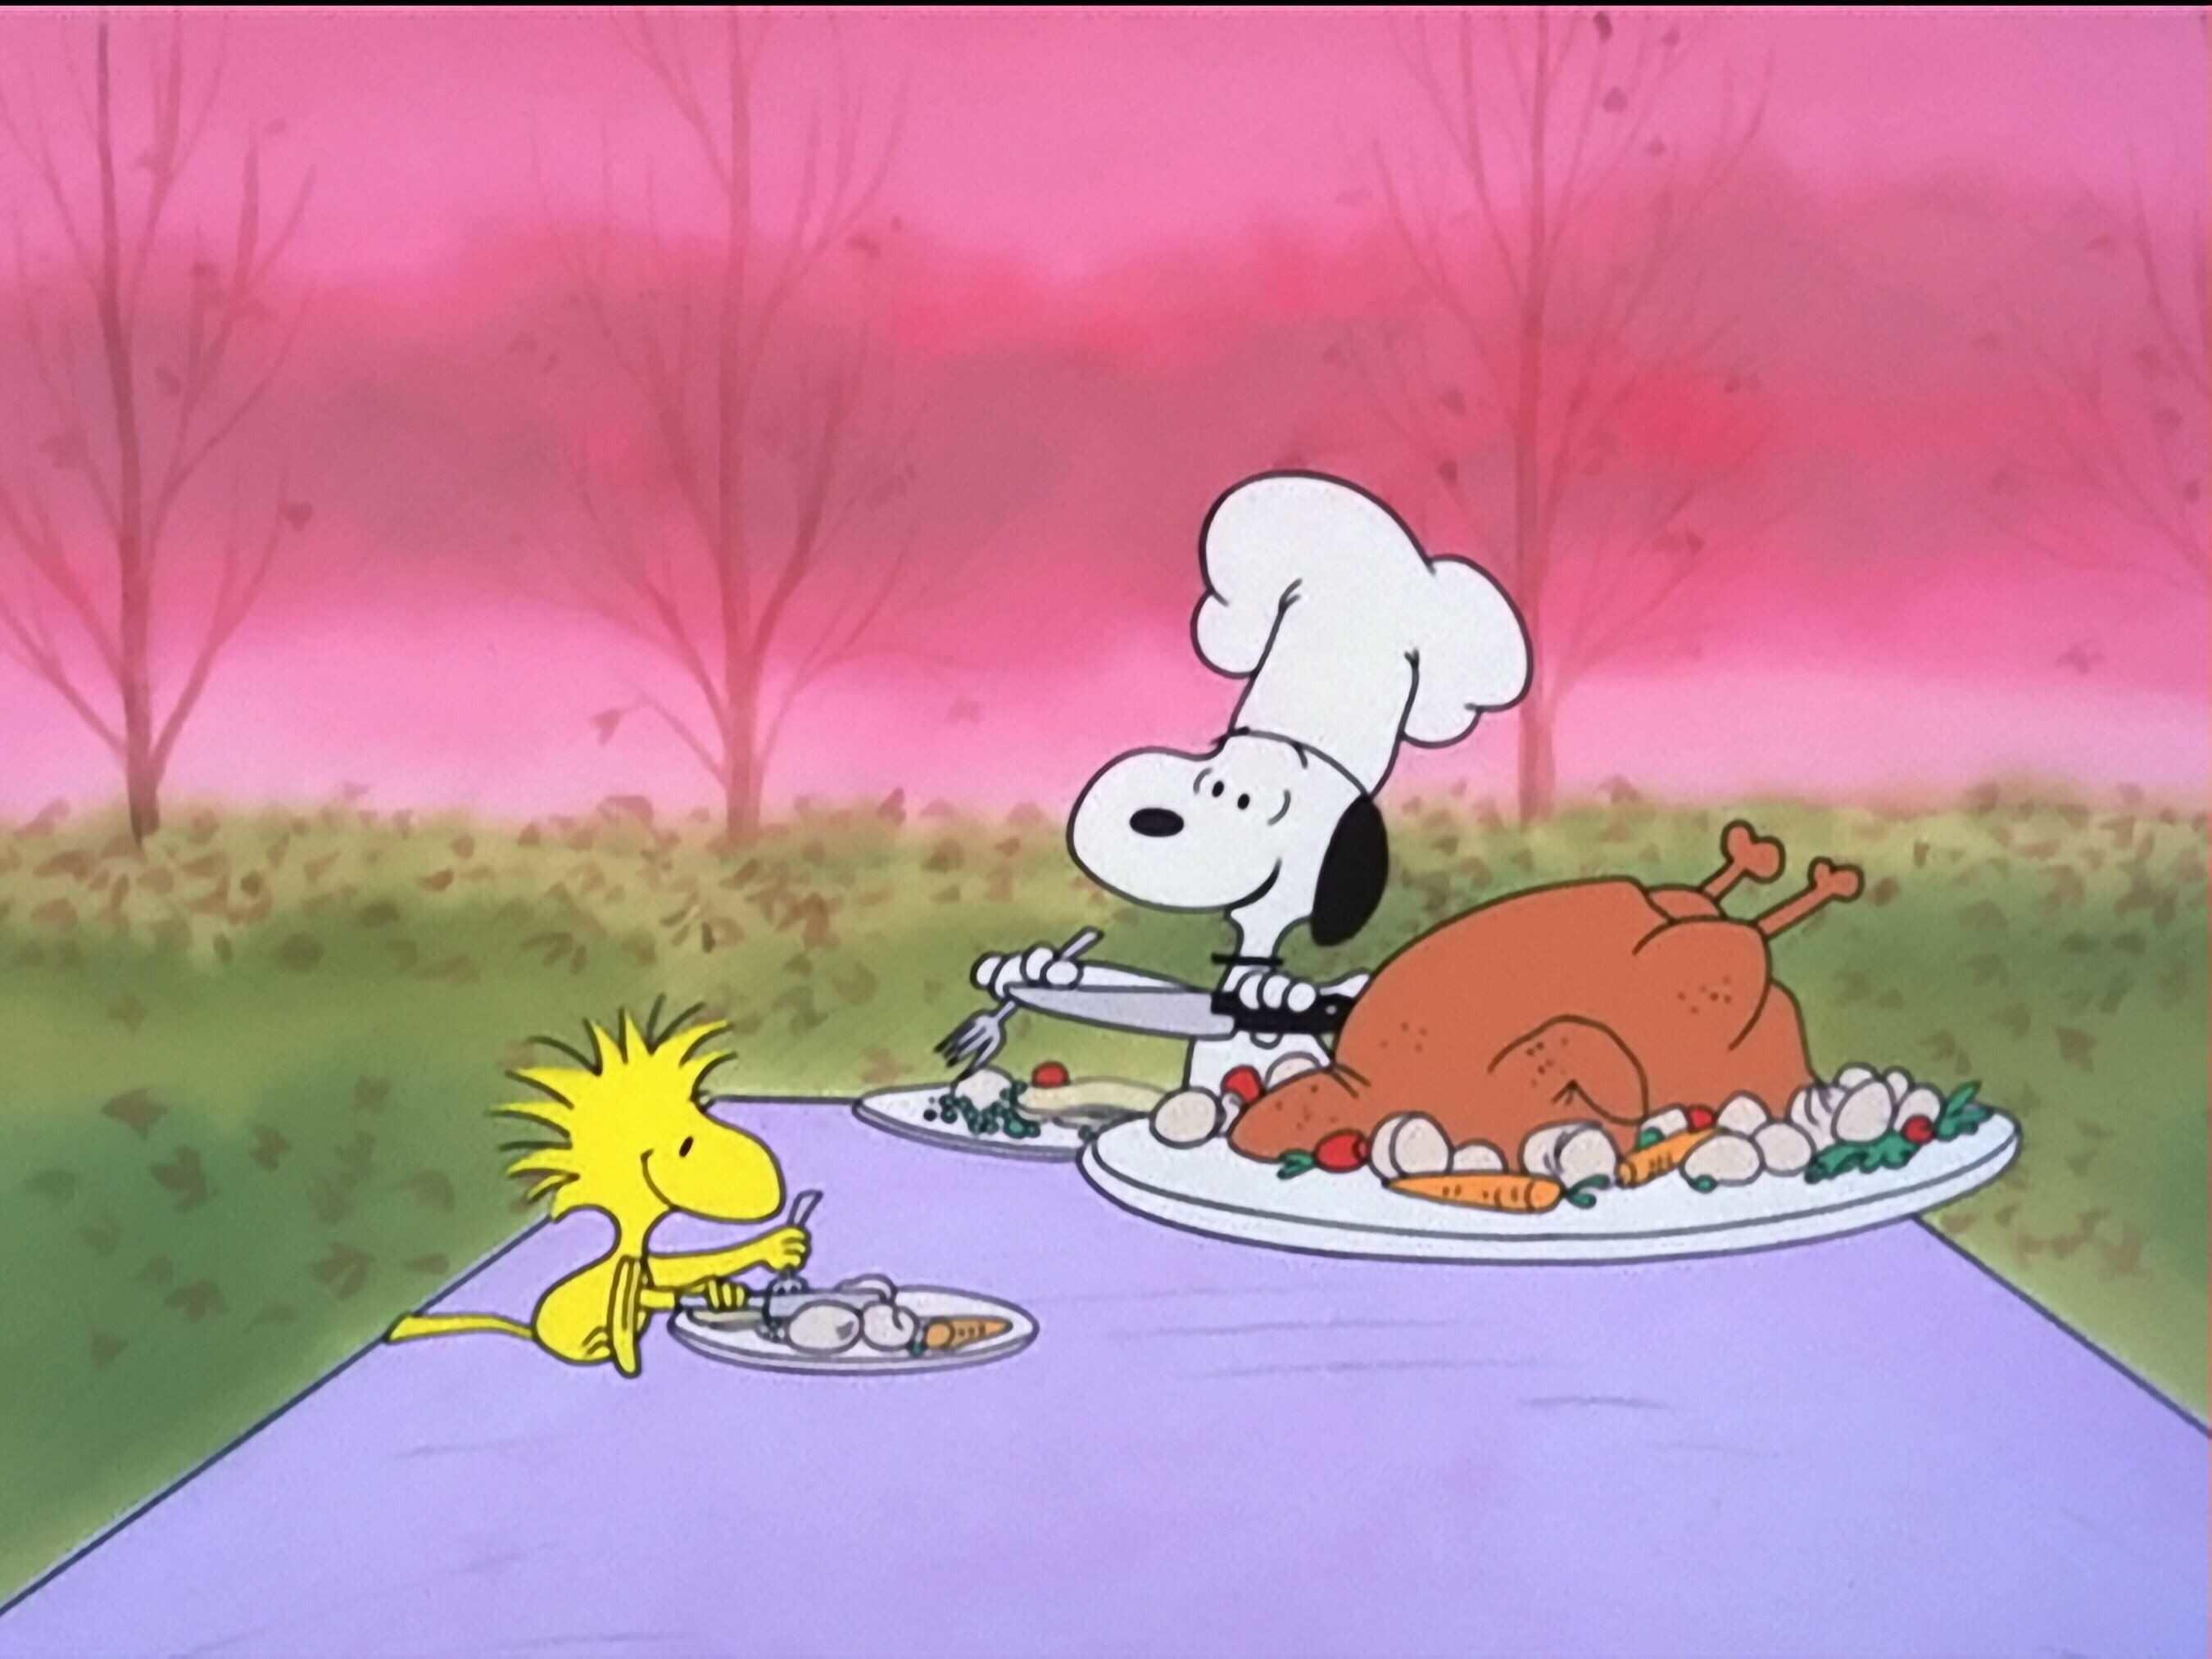 Spongebob Thanksgiving Wallpapers (62+ images)